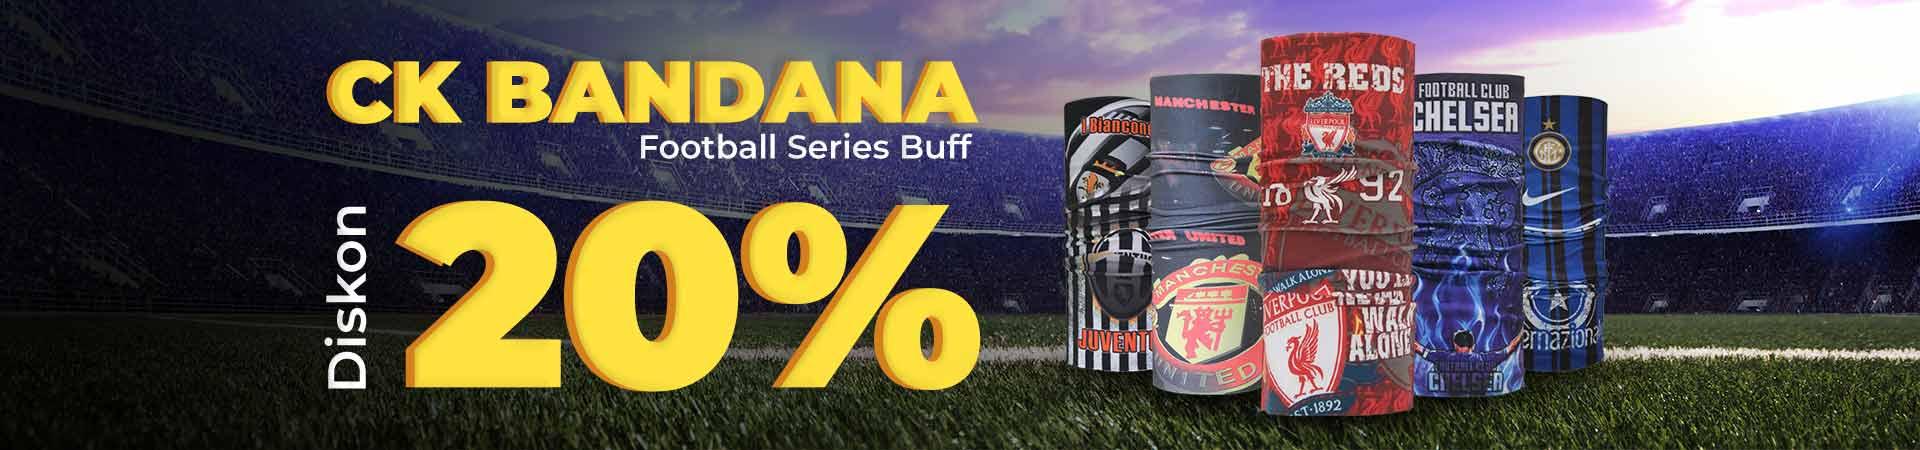 Diskon 20% CK Bandana Buff Football Series